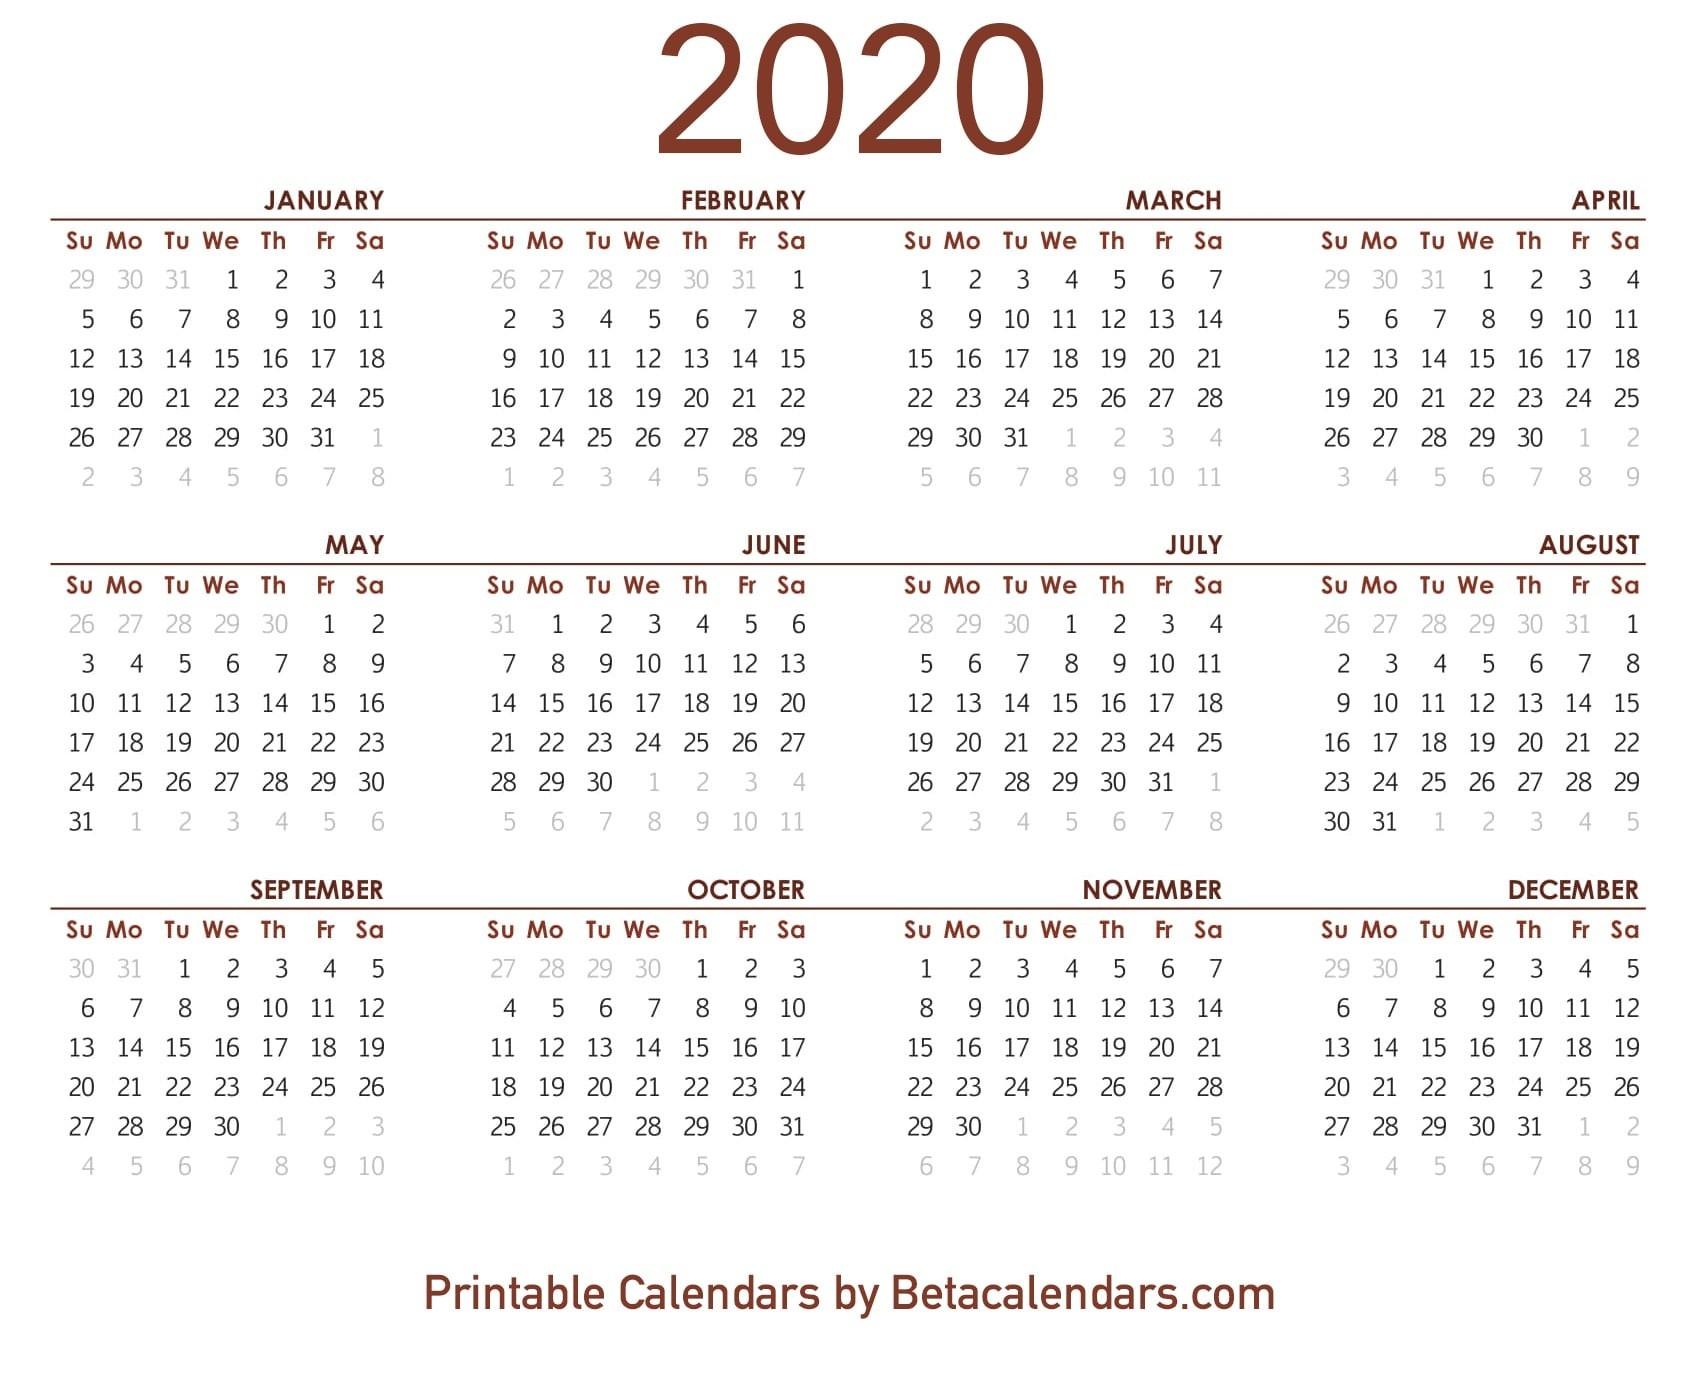 2020 Calendar - Free Printable Yearly Calendar 2020  2020 Calendar Year Printable